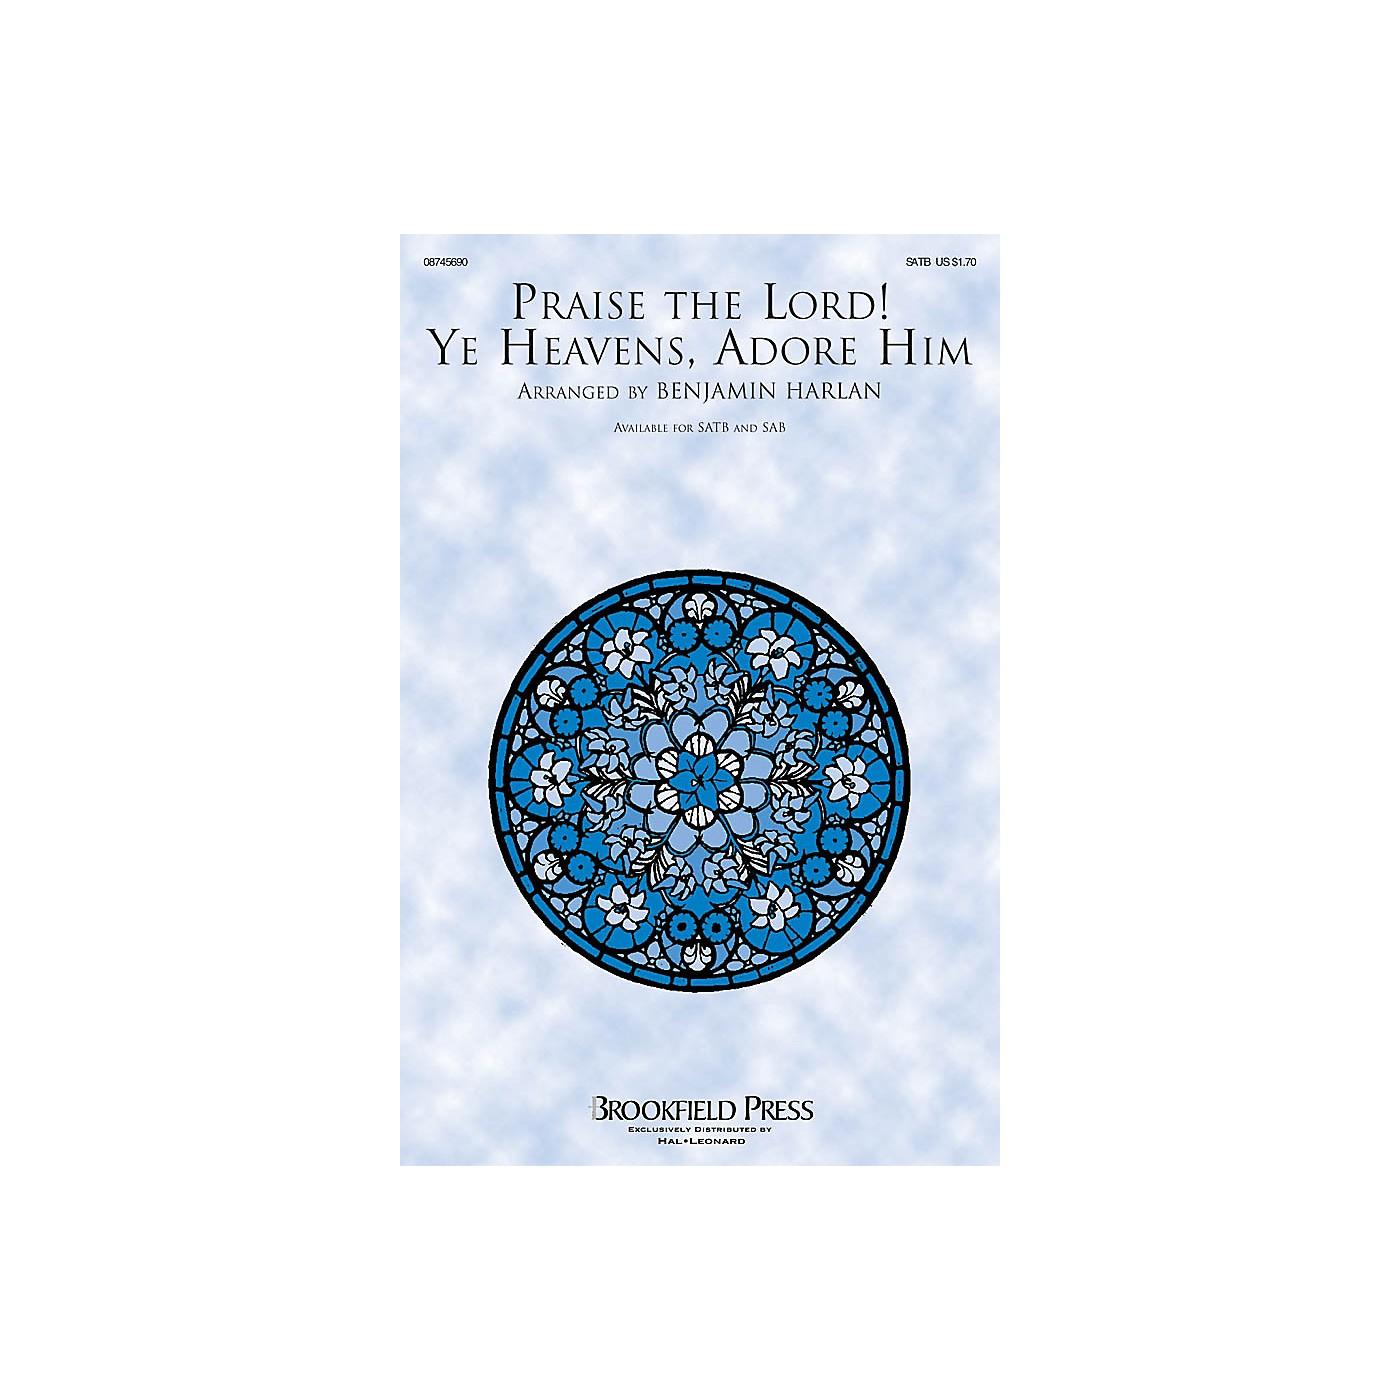 Brookfield Praise the Lord! Ye Heavens, Adore Him IPAKO Arranged by Benjamin Harlan thumbnail